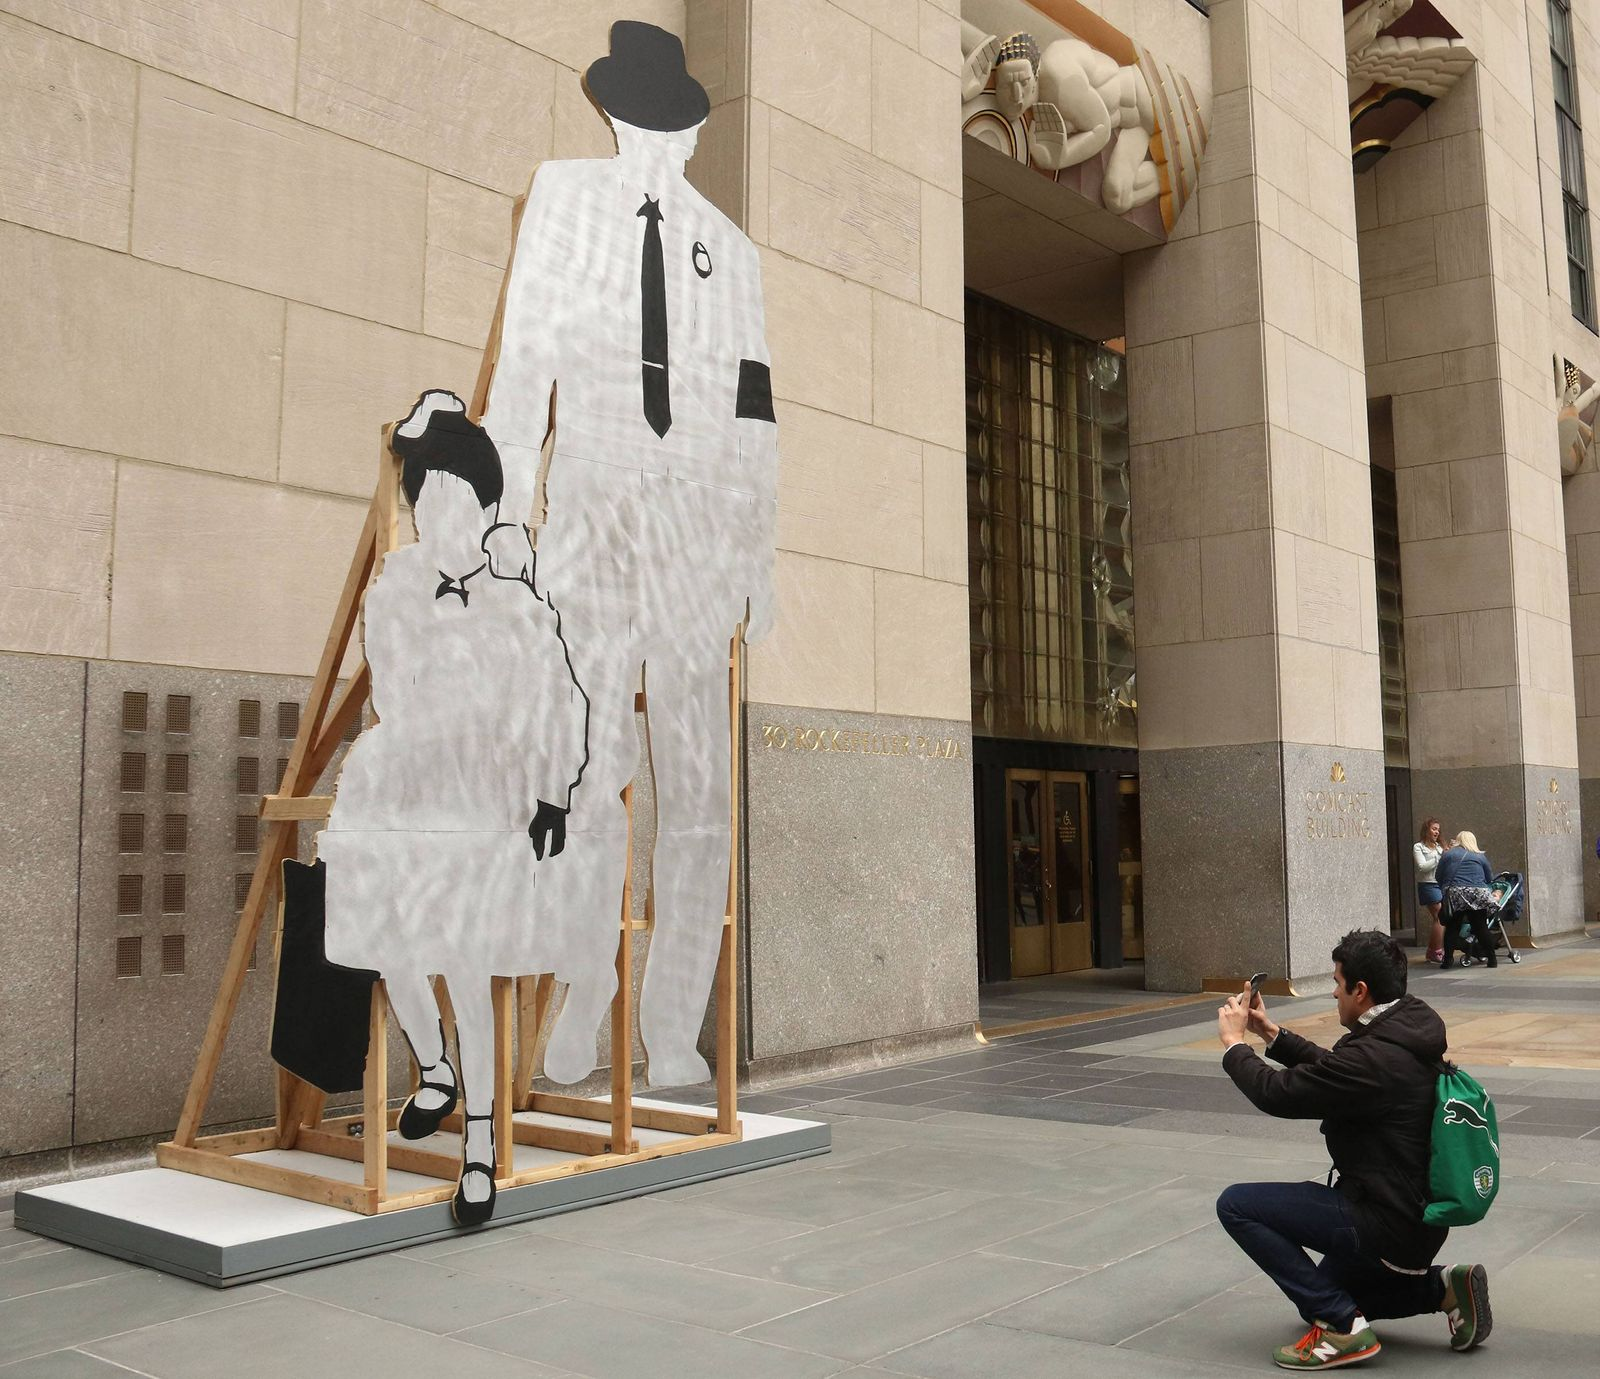 April 27 2019 New York City New York U S Artwork by PAULO NAZARETH RUBY on display which de